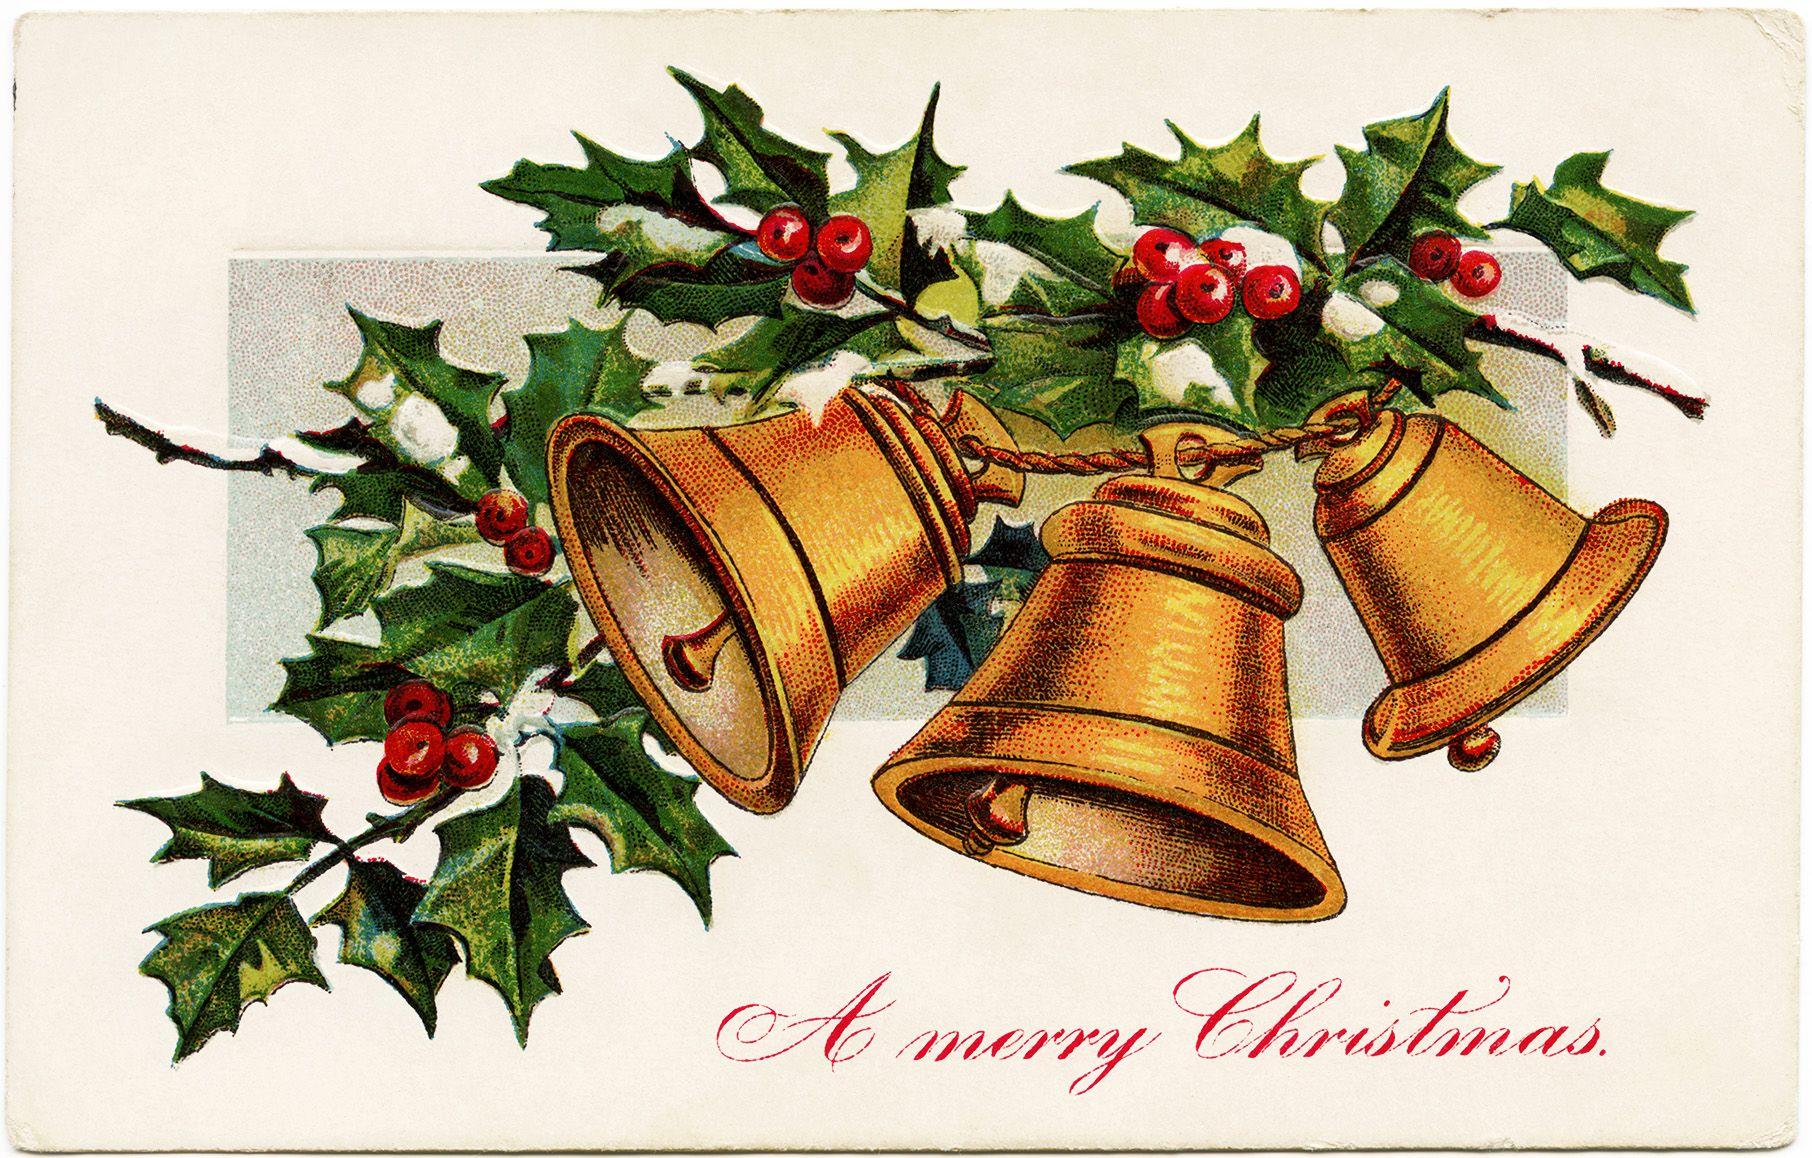 Vintage Christmas Postcard, Public Domain Christmas Image